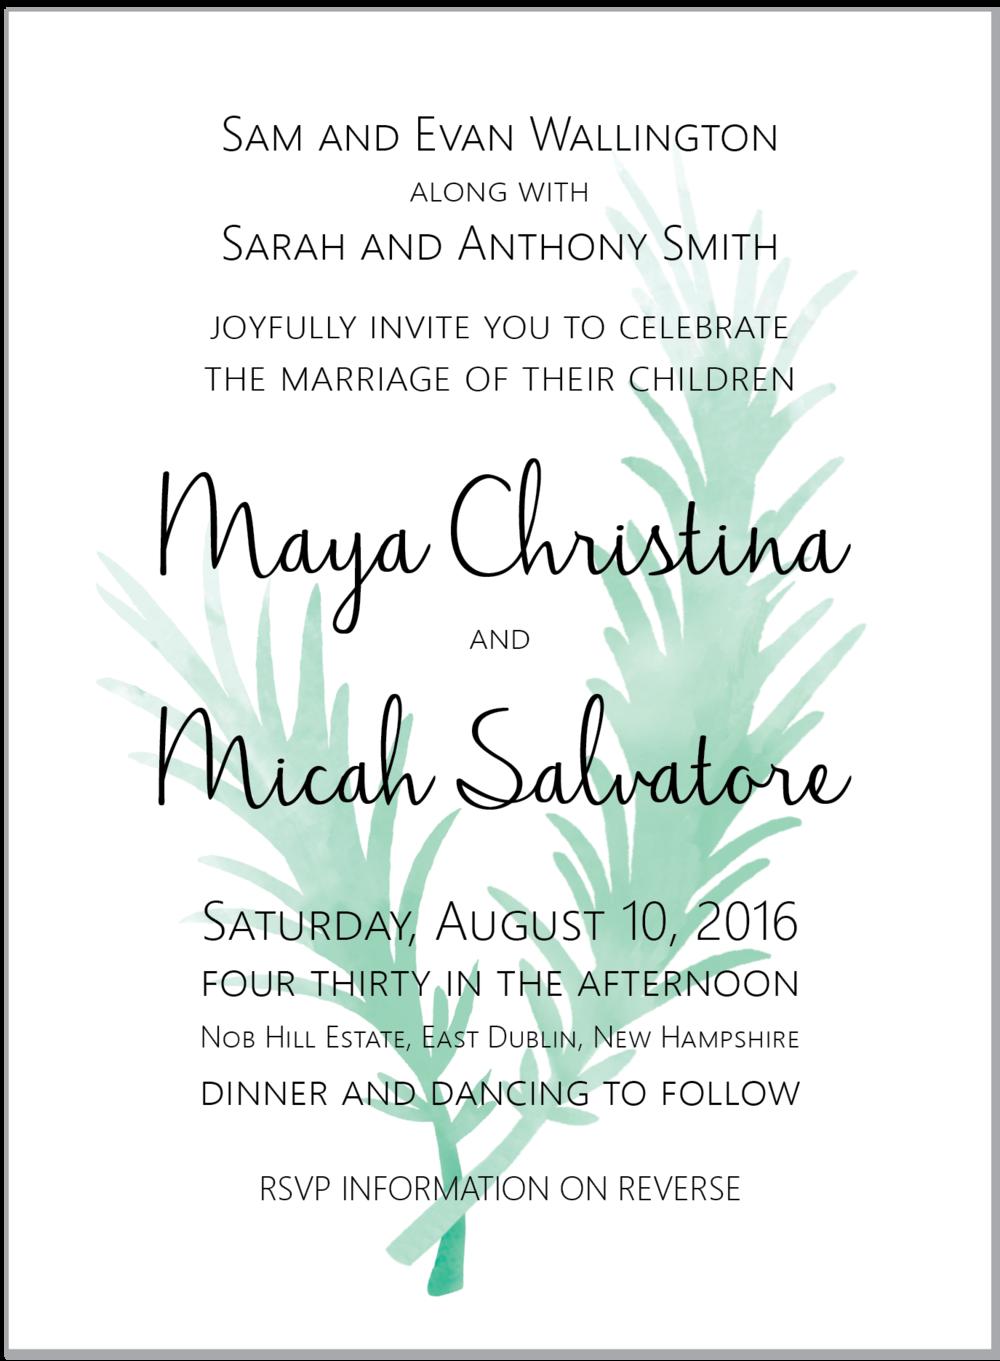 Wedding Invitation Fake.png